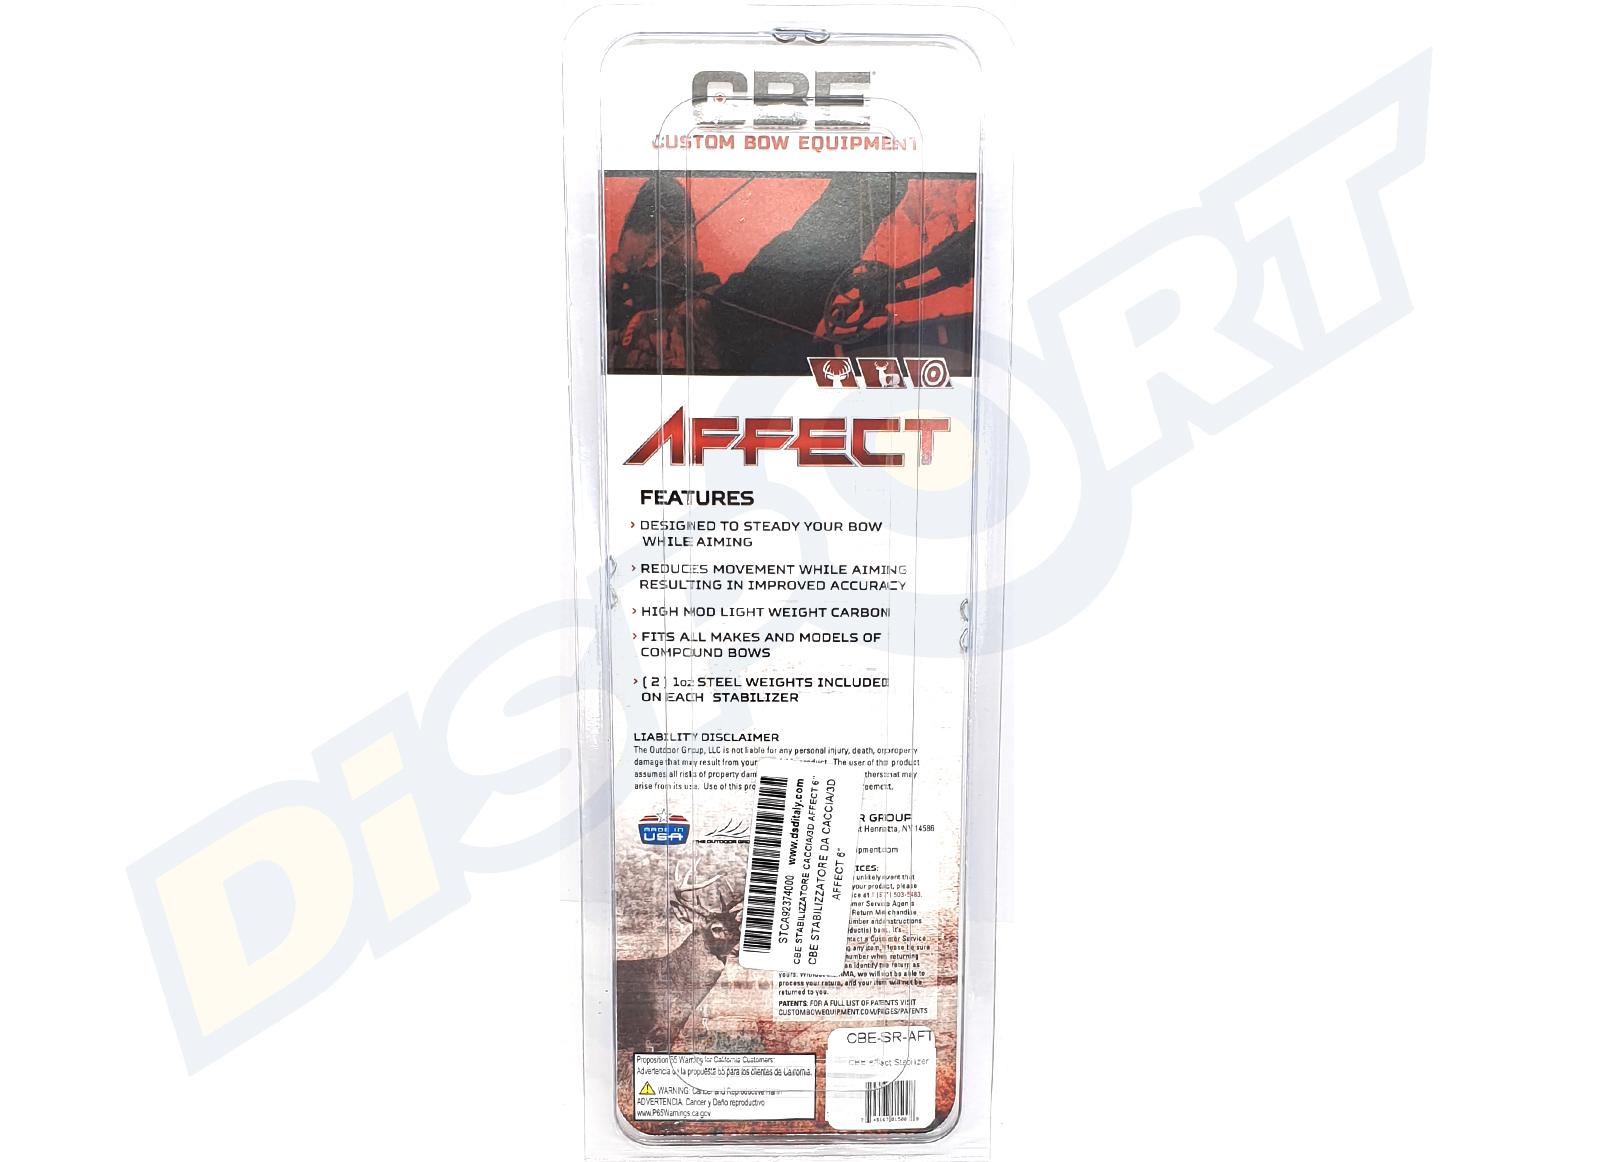 CBE STABILIZZATORE DA CACCIA/3D AFFECT 6'